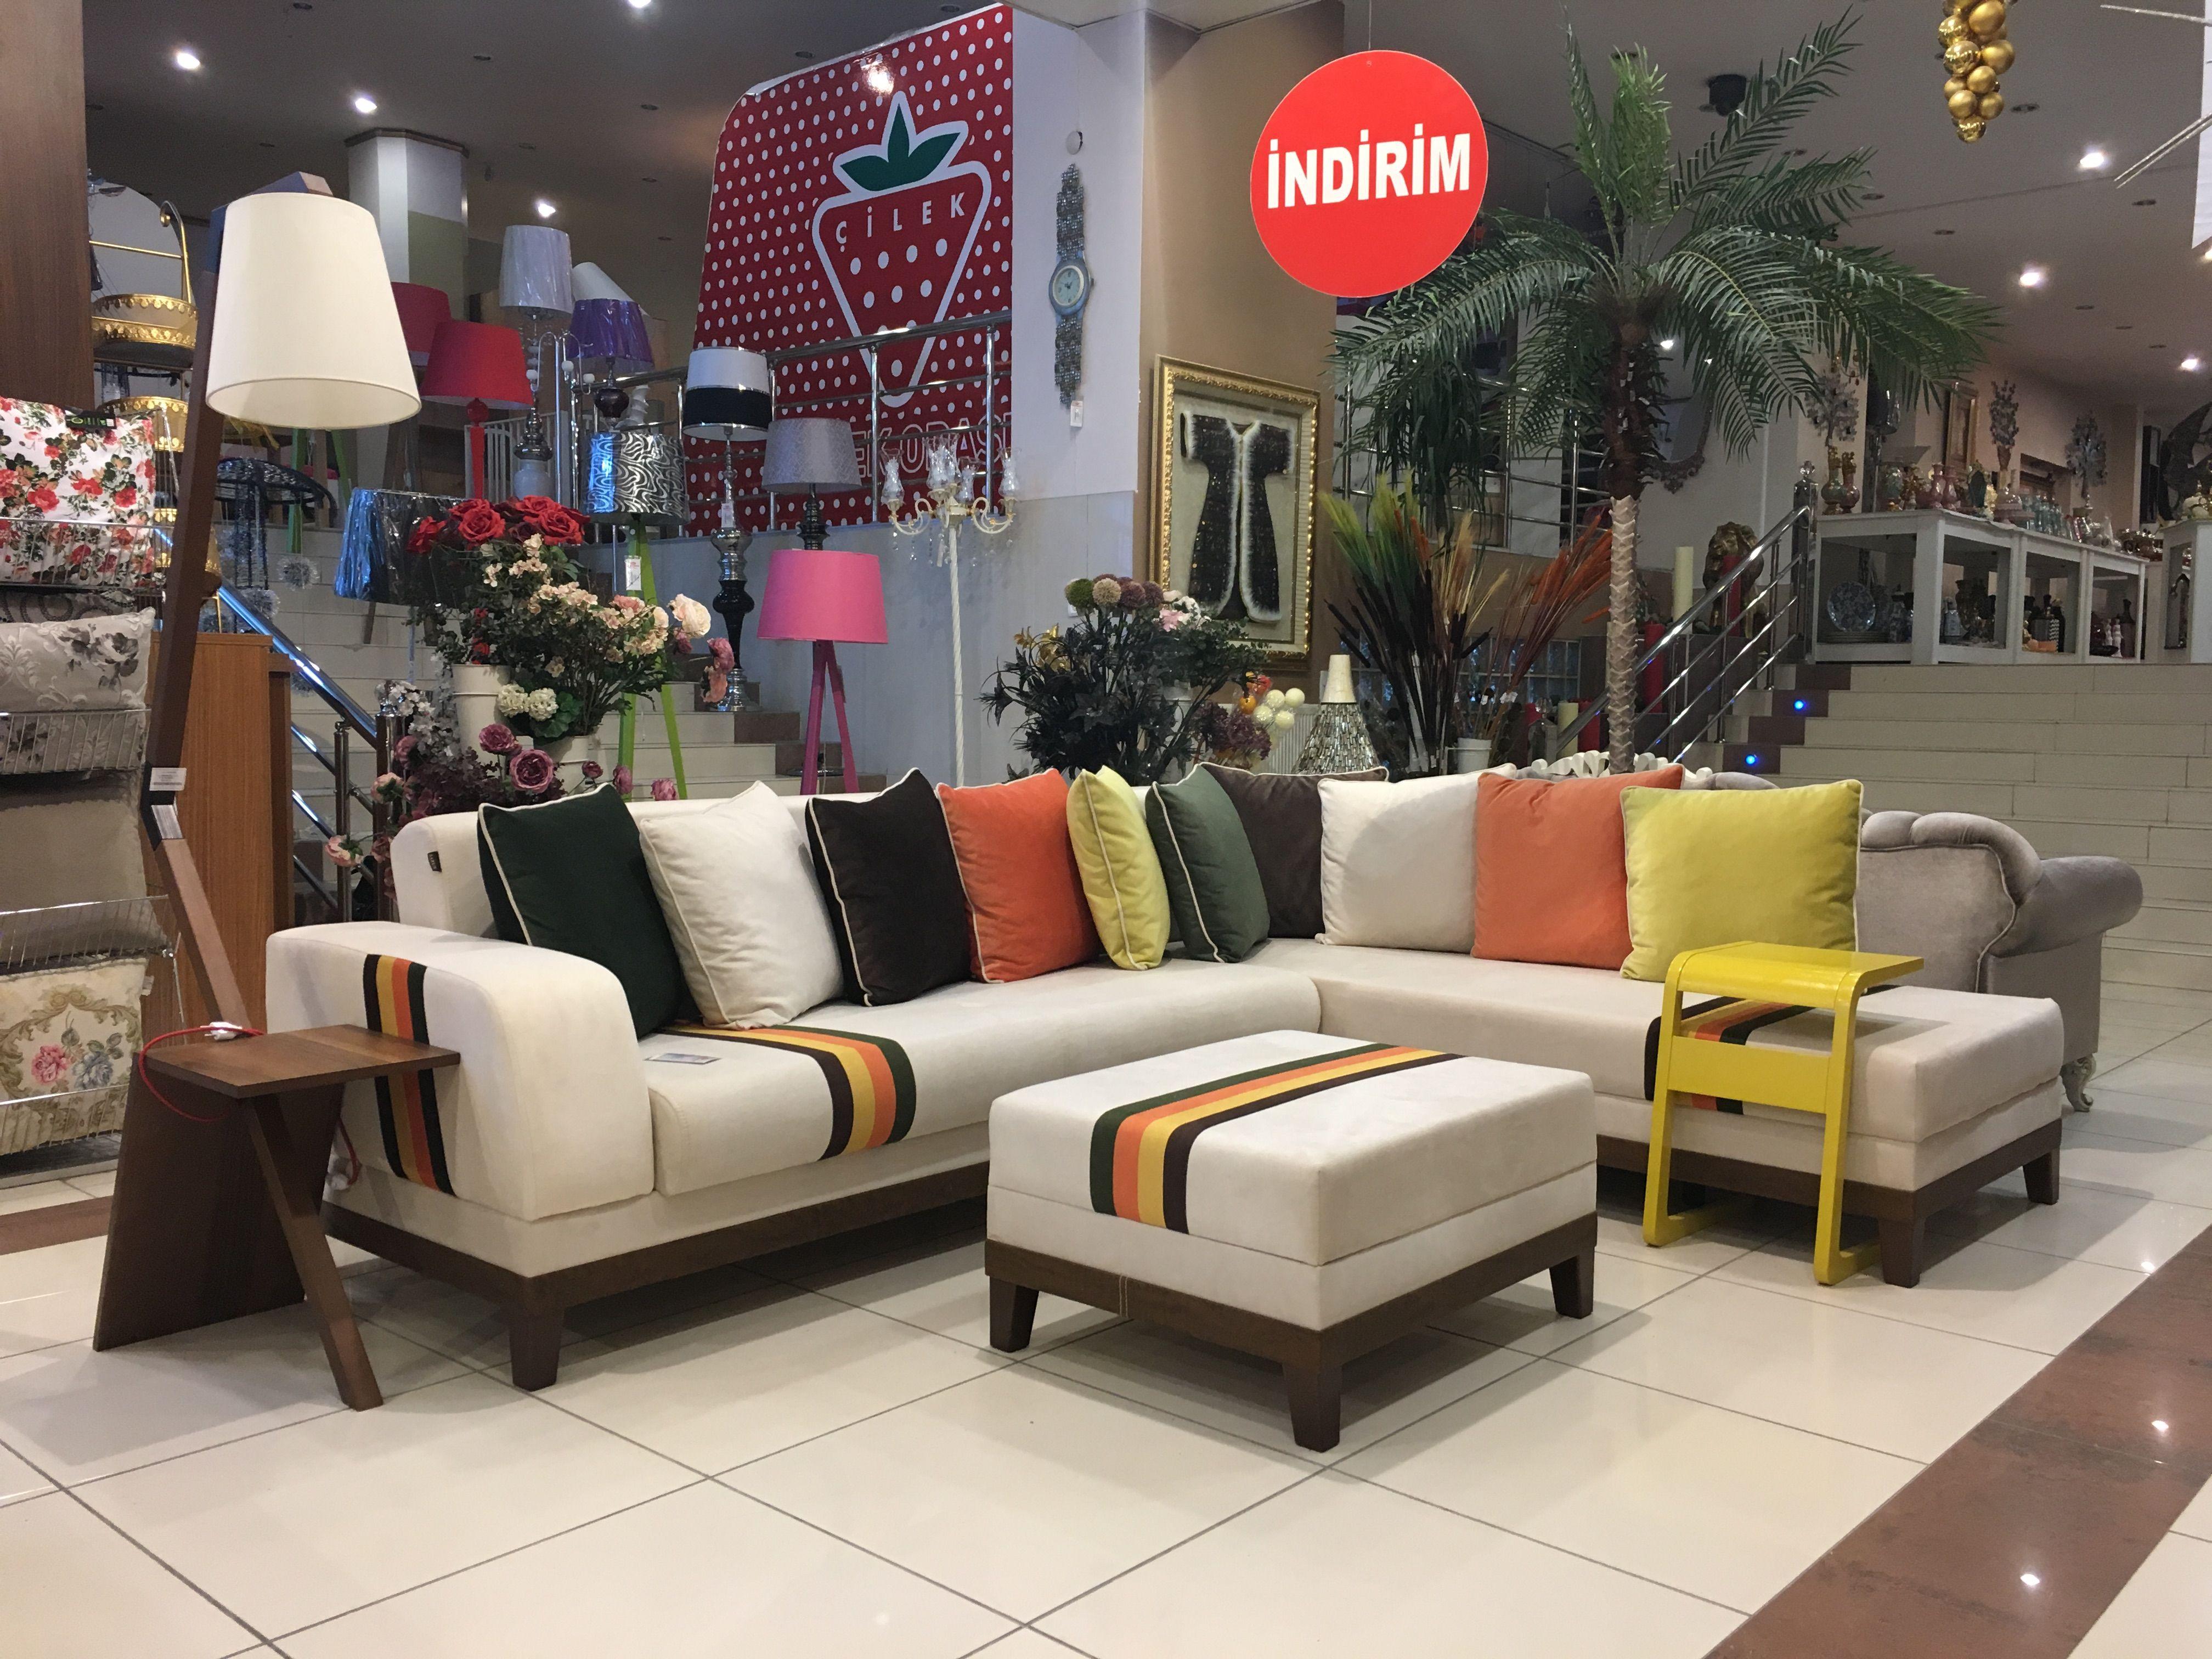 Turkmenoglu Alisveris Merkezi Adli Kullanicinin Turkmenoglu Koltuk Takimlari Sofa And Living Room Sets Panosundaki Pin Koltuklar